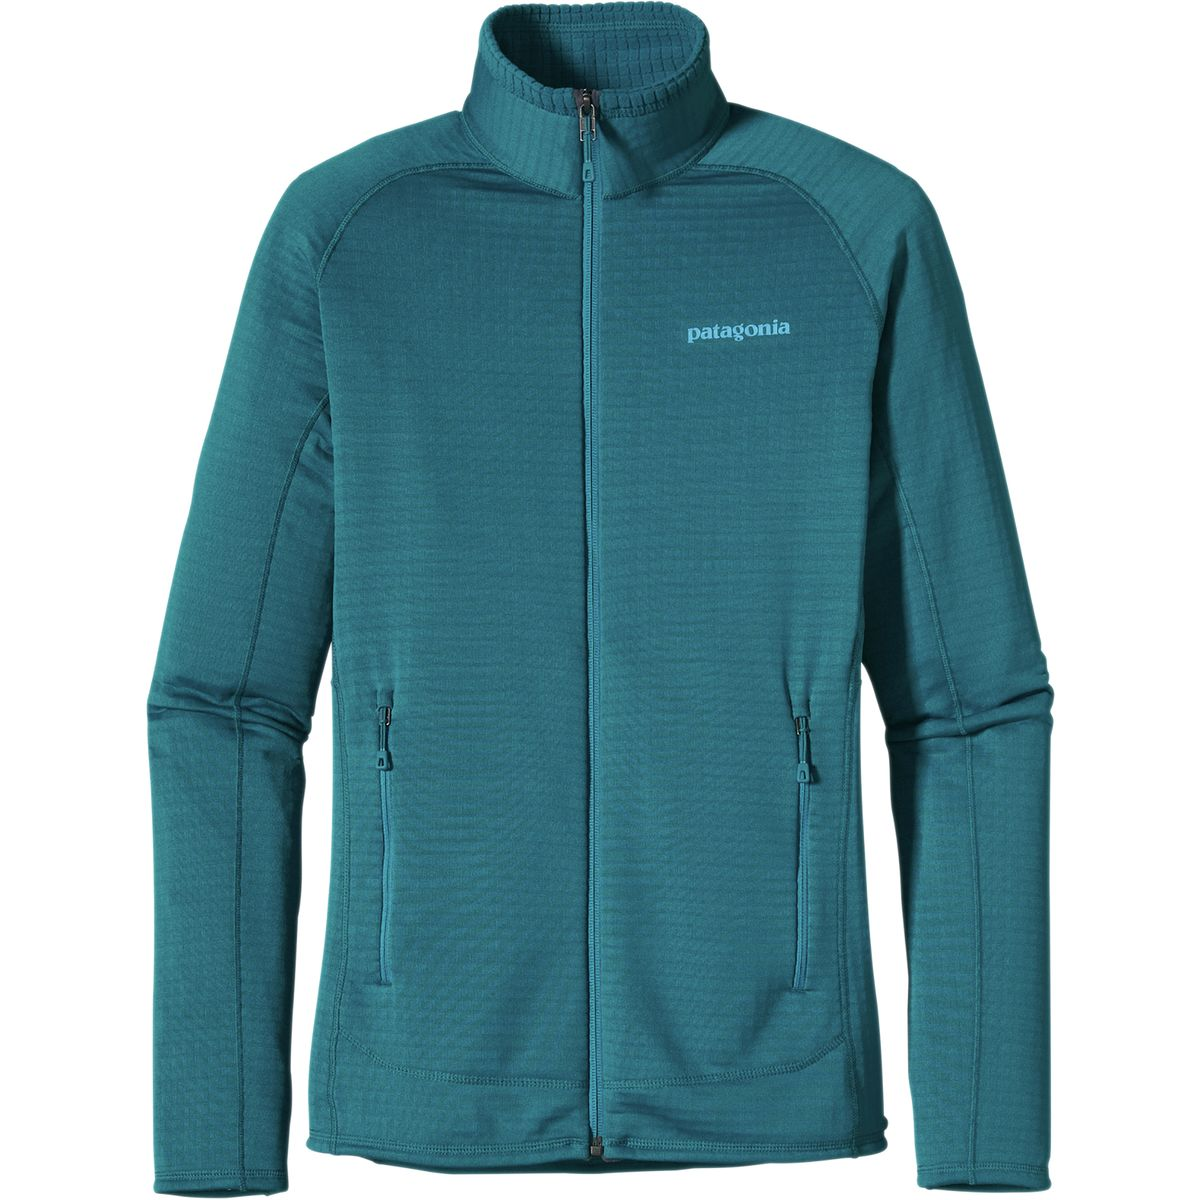 Patagonia R1 Full-Zip Fleece Jacket - Women